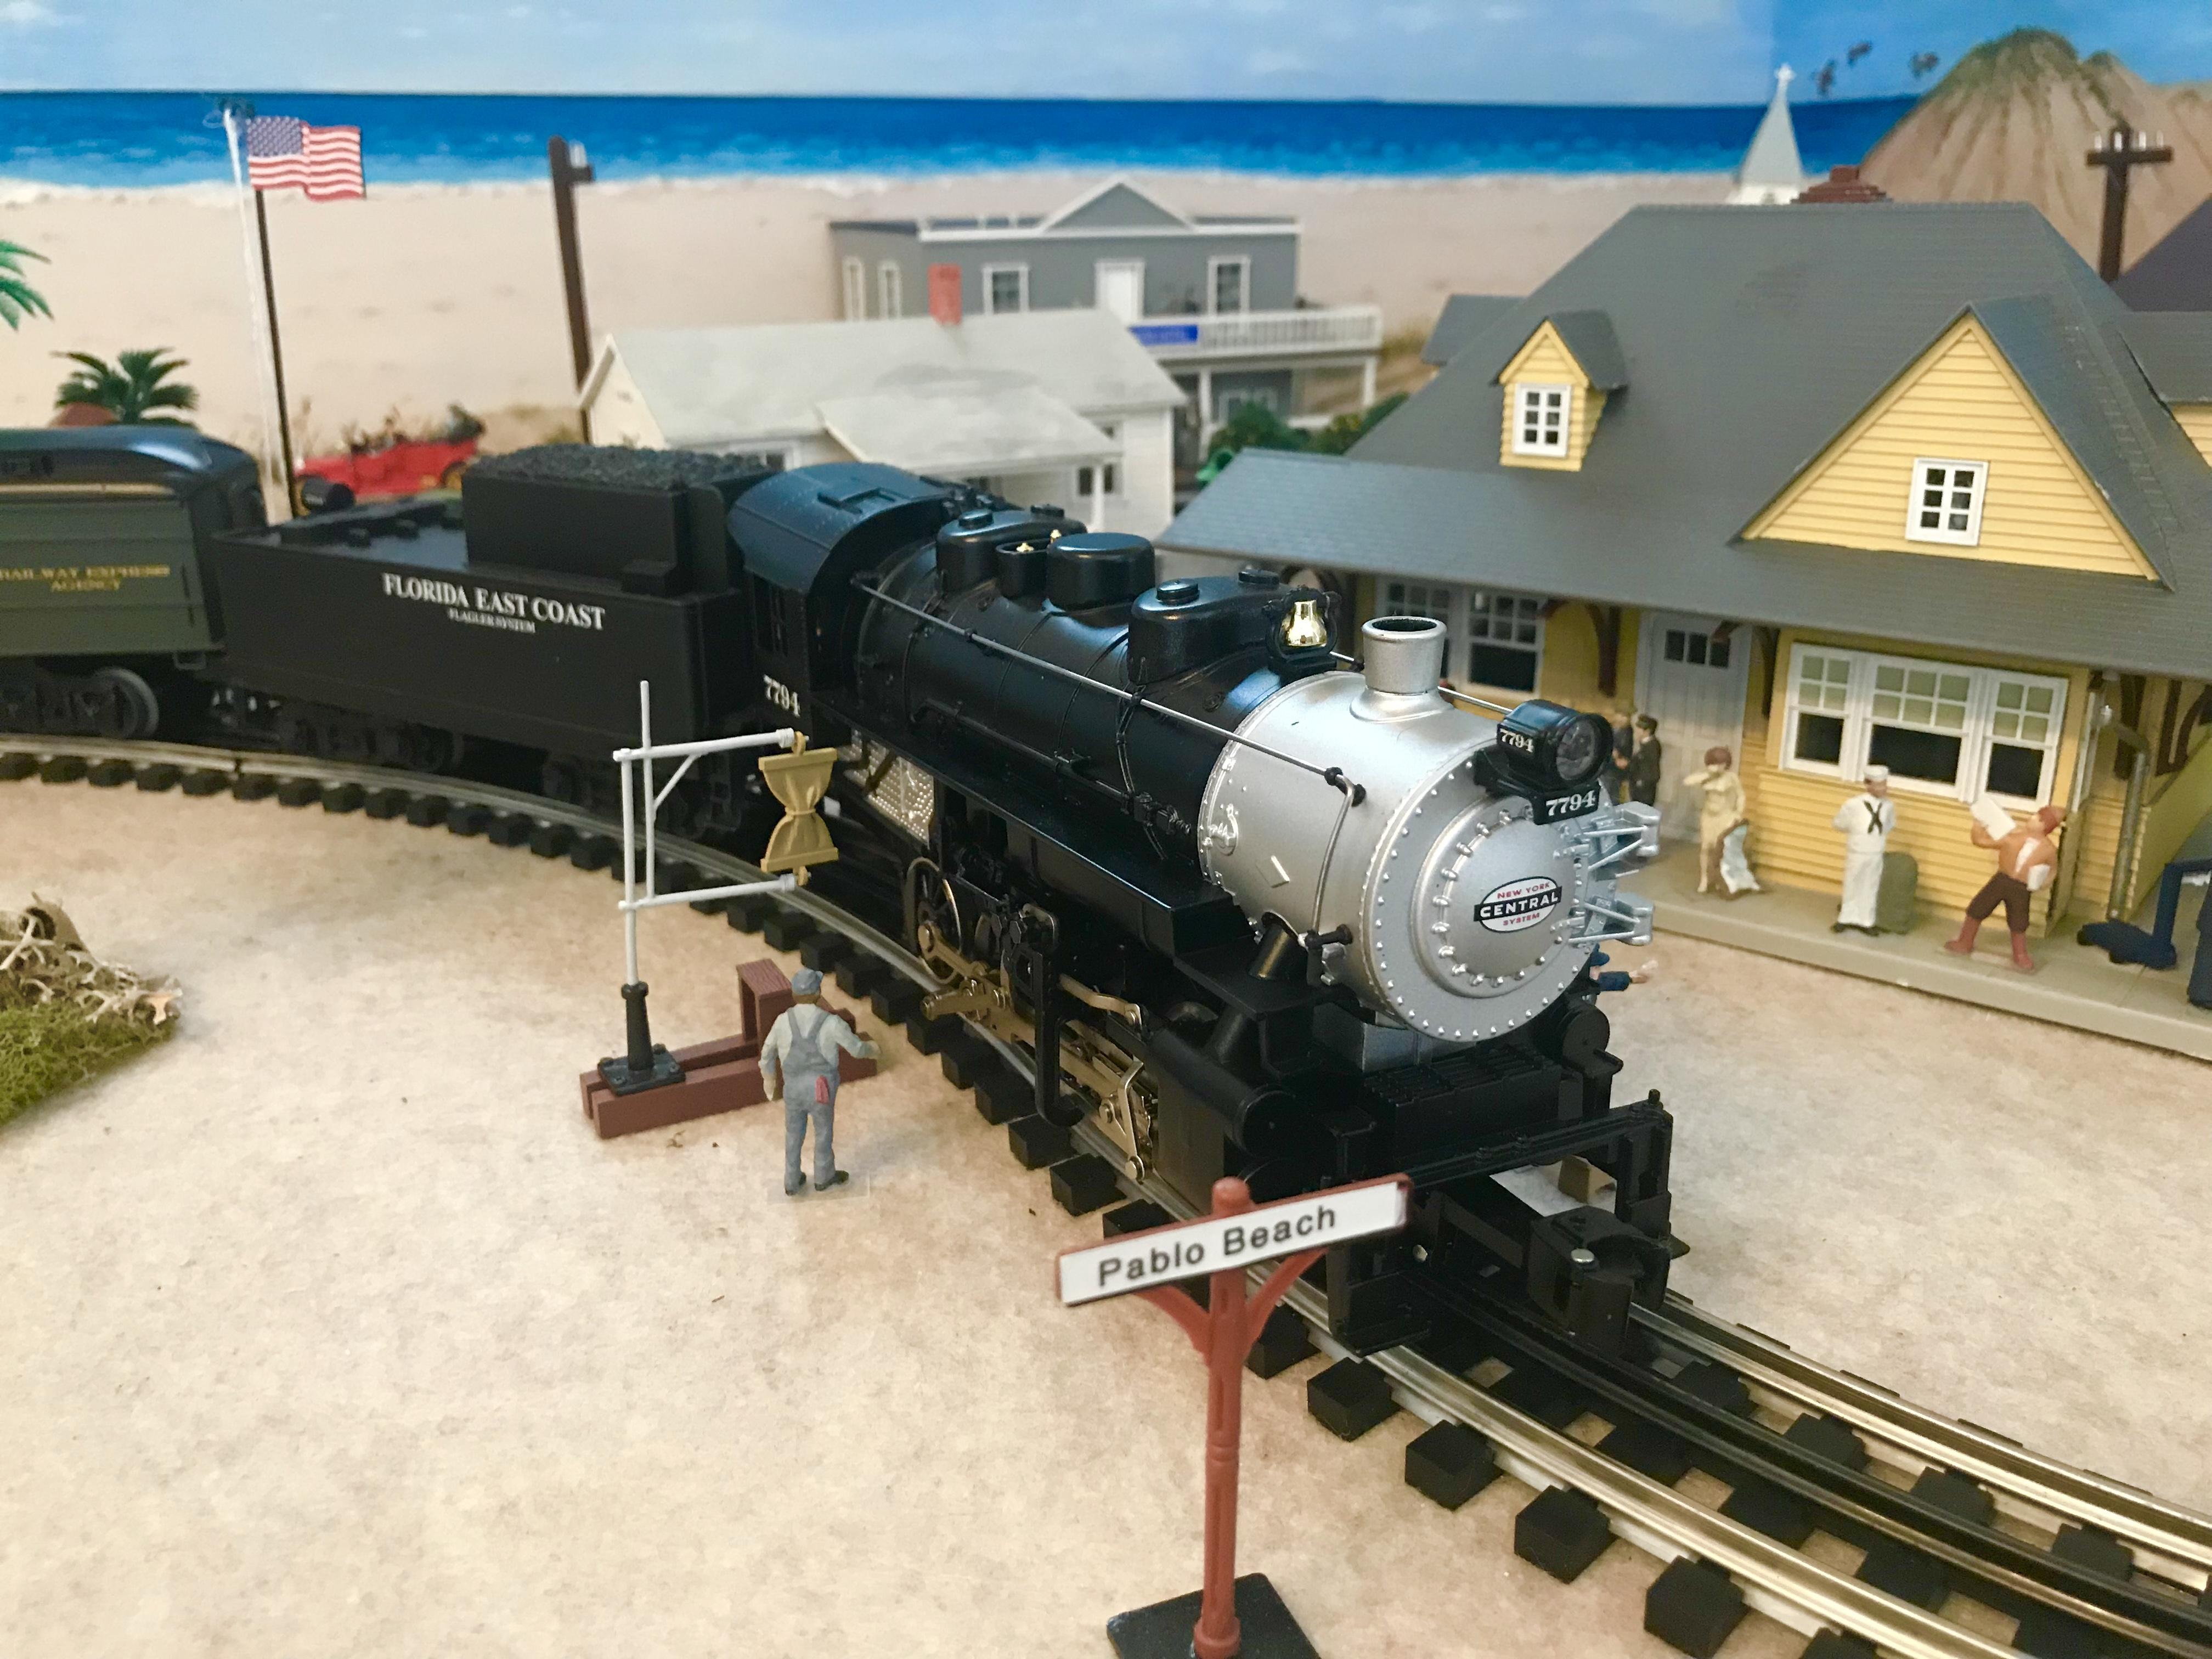 Model Train showing historic Pablo Beach, Florida